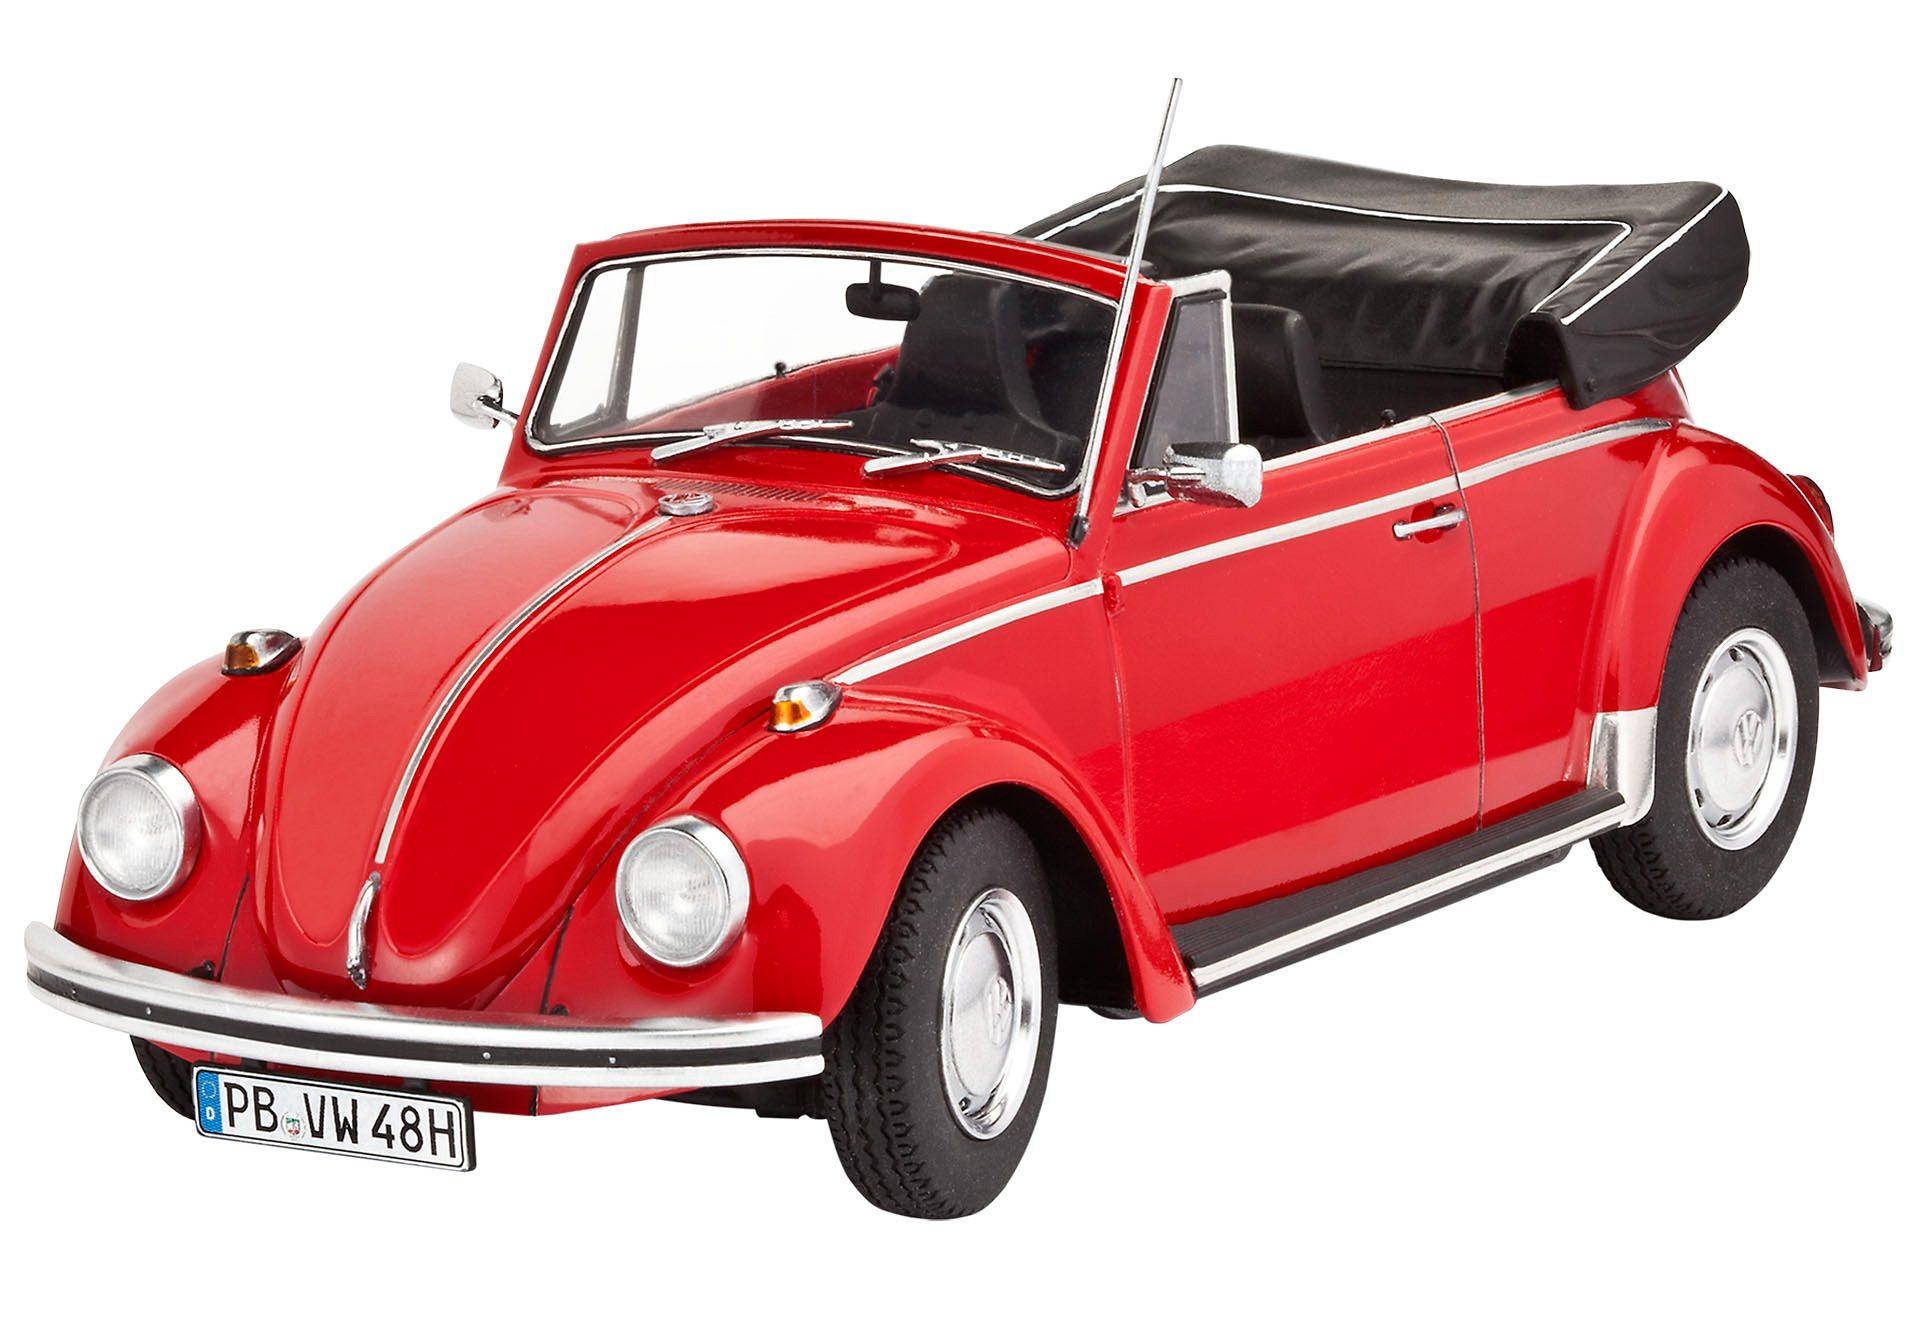 Revell® Modellbausatz Auto mit Zubehör, Maßstab 1:24, »VW Beetle Cabriolet 1970«